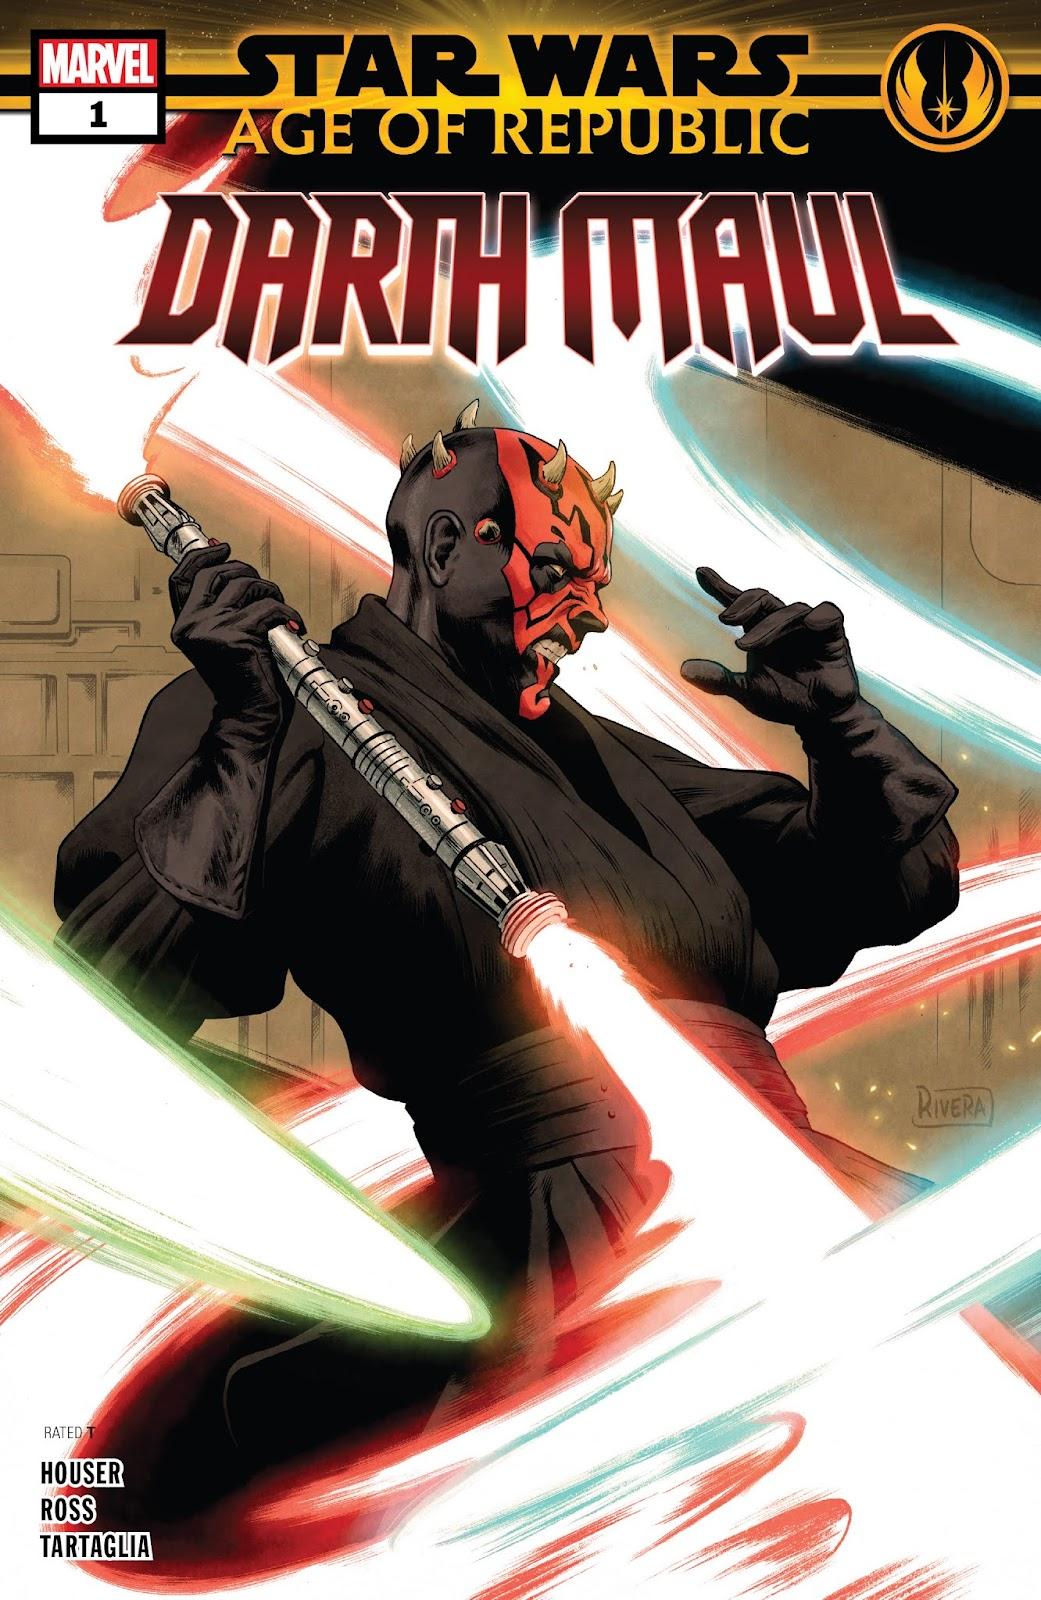 Read online Star Wars: Age of Republic - Darth Maul comic -  Issue # Full - 1